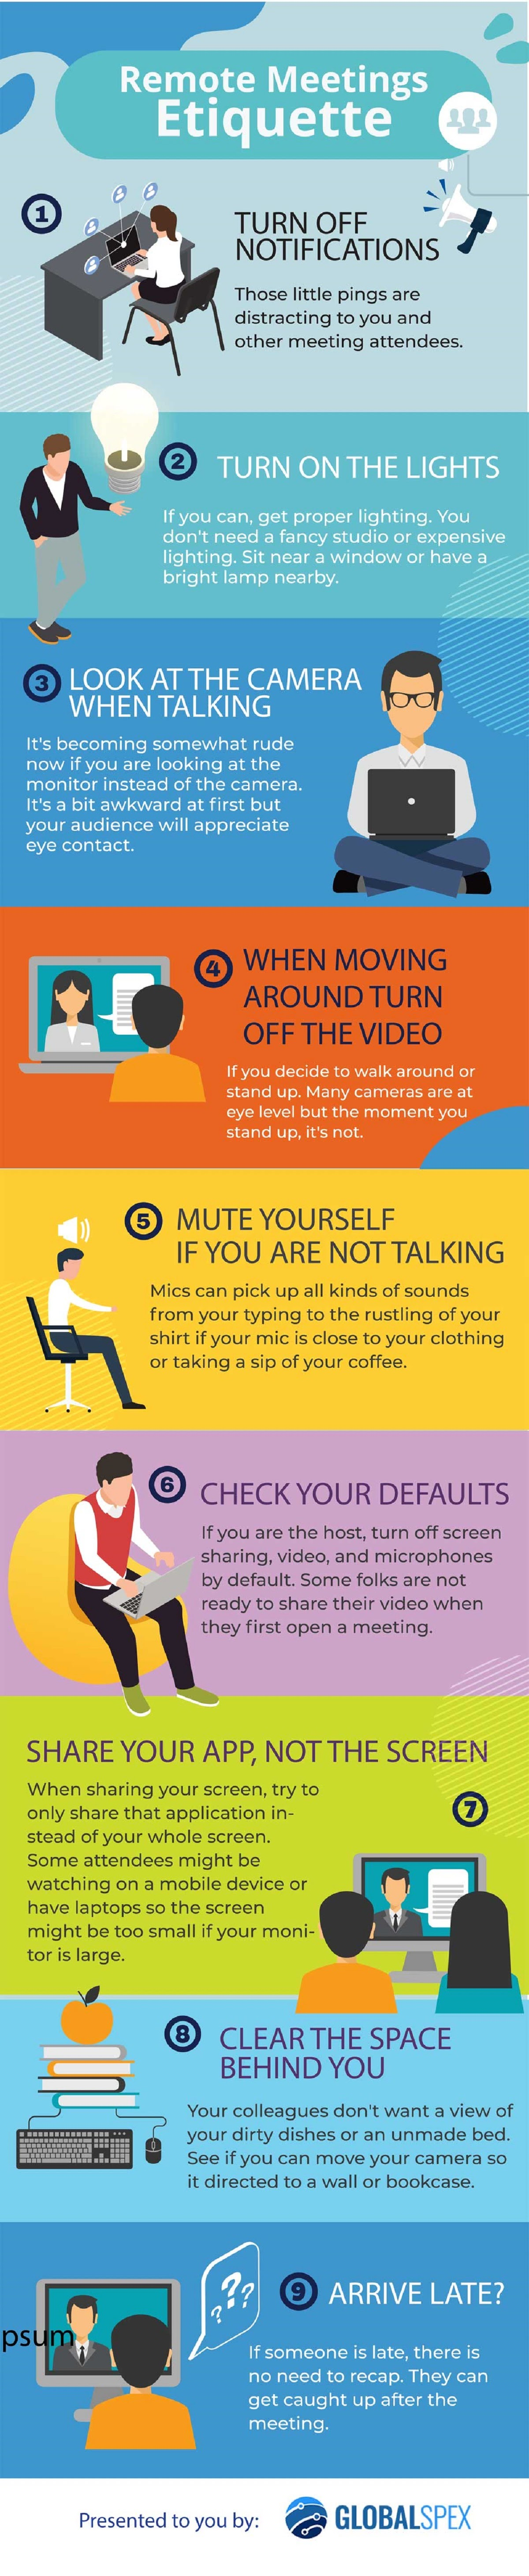 zoom-virtual-meeting-etiquette-infographic